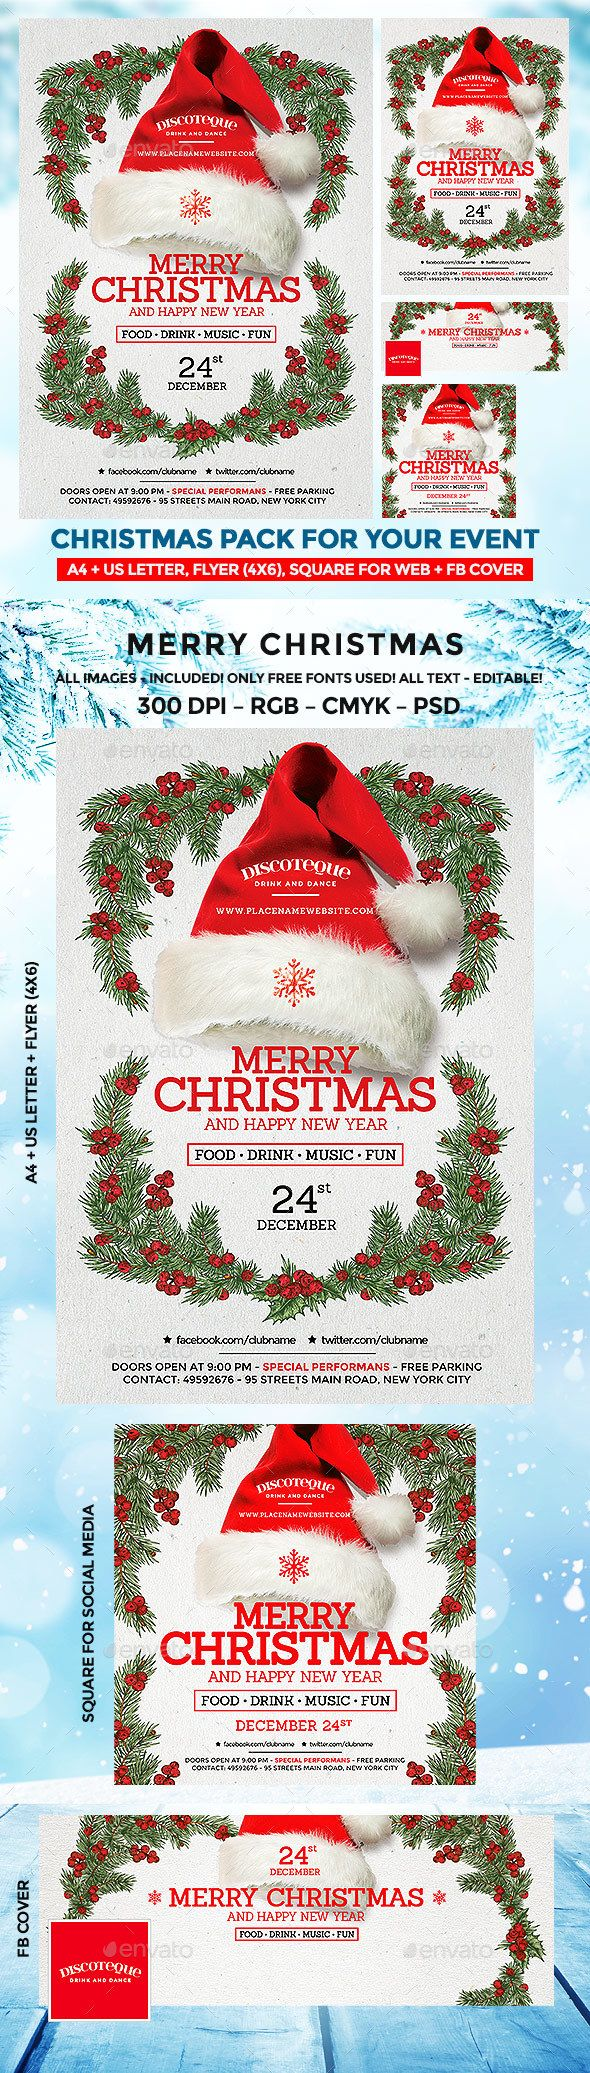 Christmas Flyer christmas christmasbackground christmasbash christmascard ChristmasCelebration christmasevent christmasflyer christmasgift christmasinvitation christmasparty christmastemplate giftcard invitation invitationcard newyearinvitation newyearparty vintagechristmas